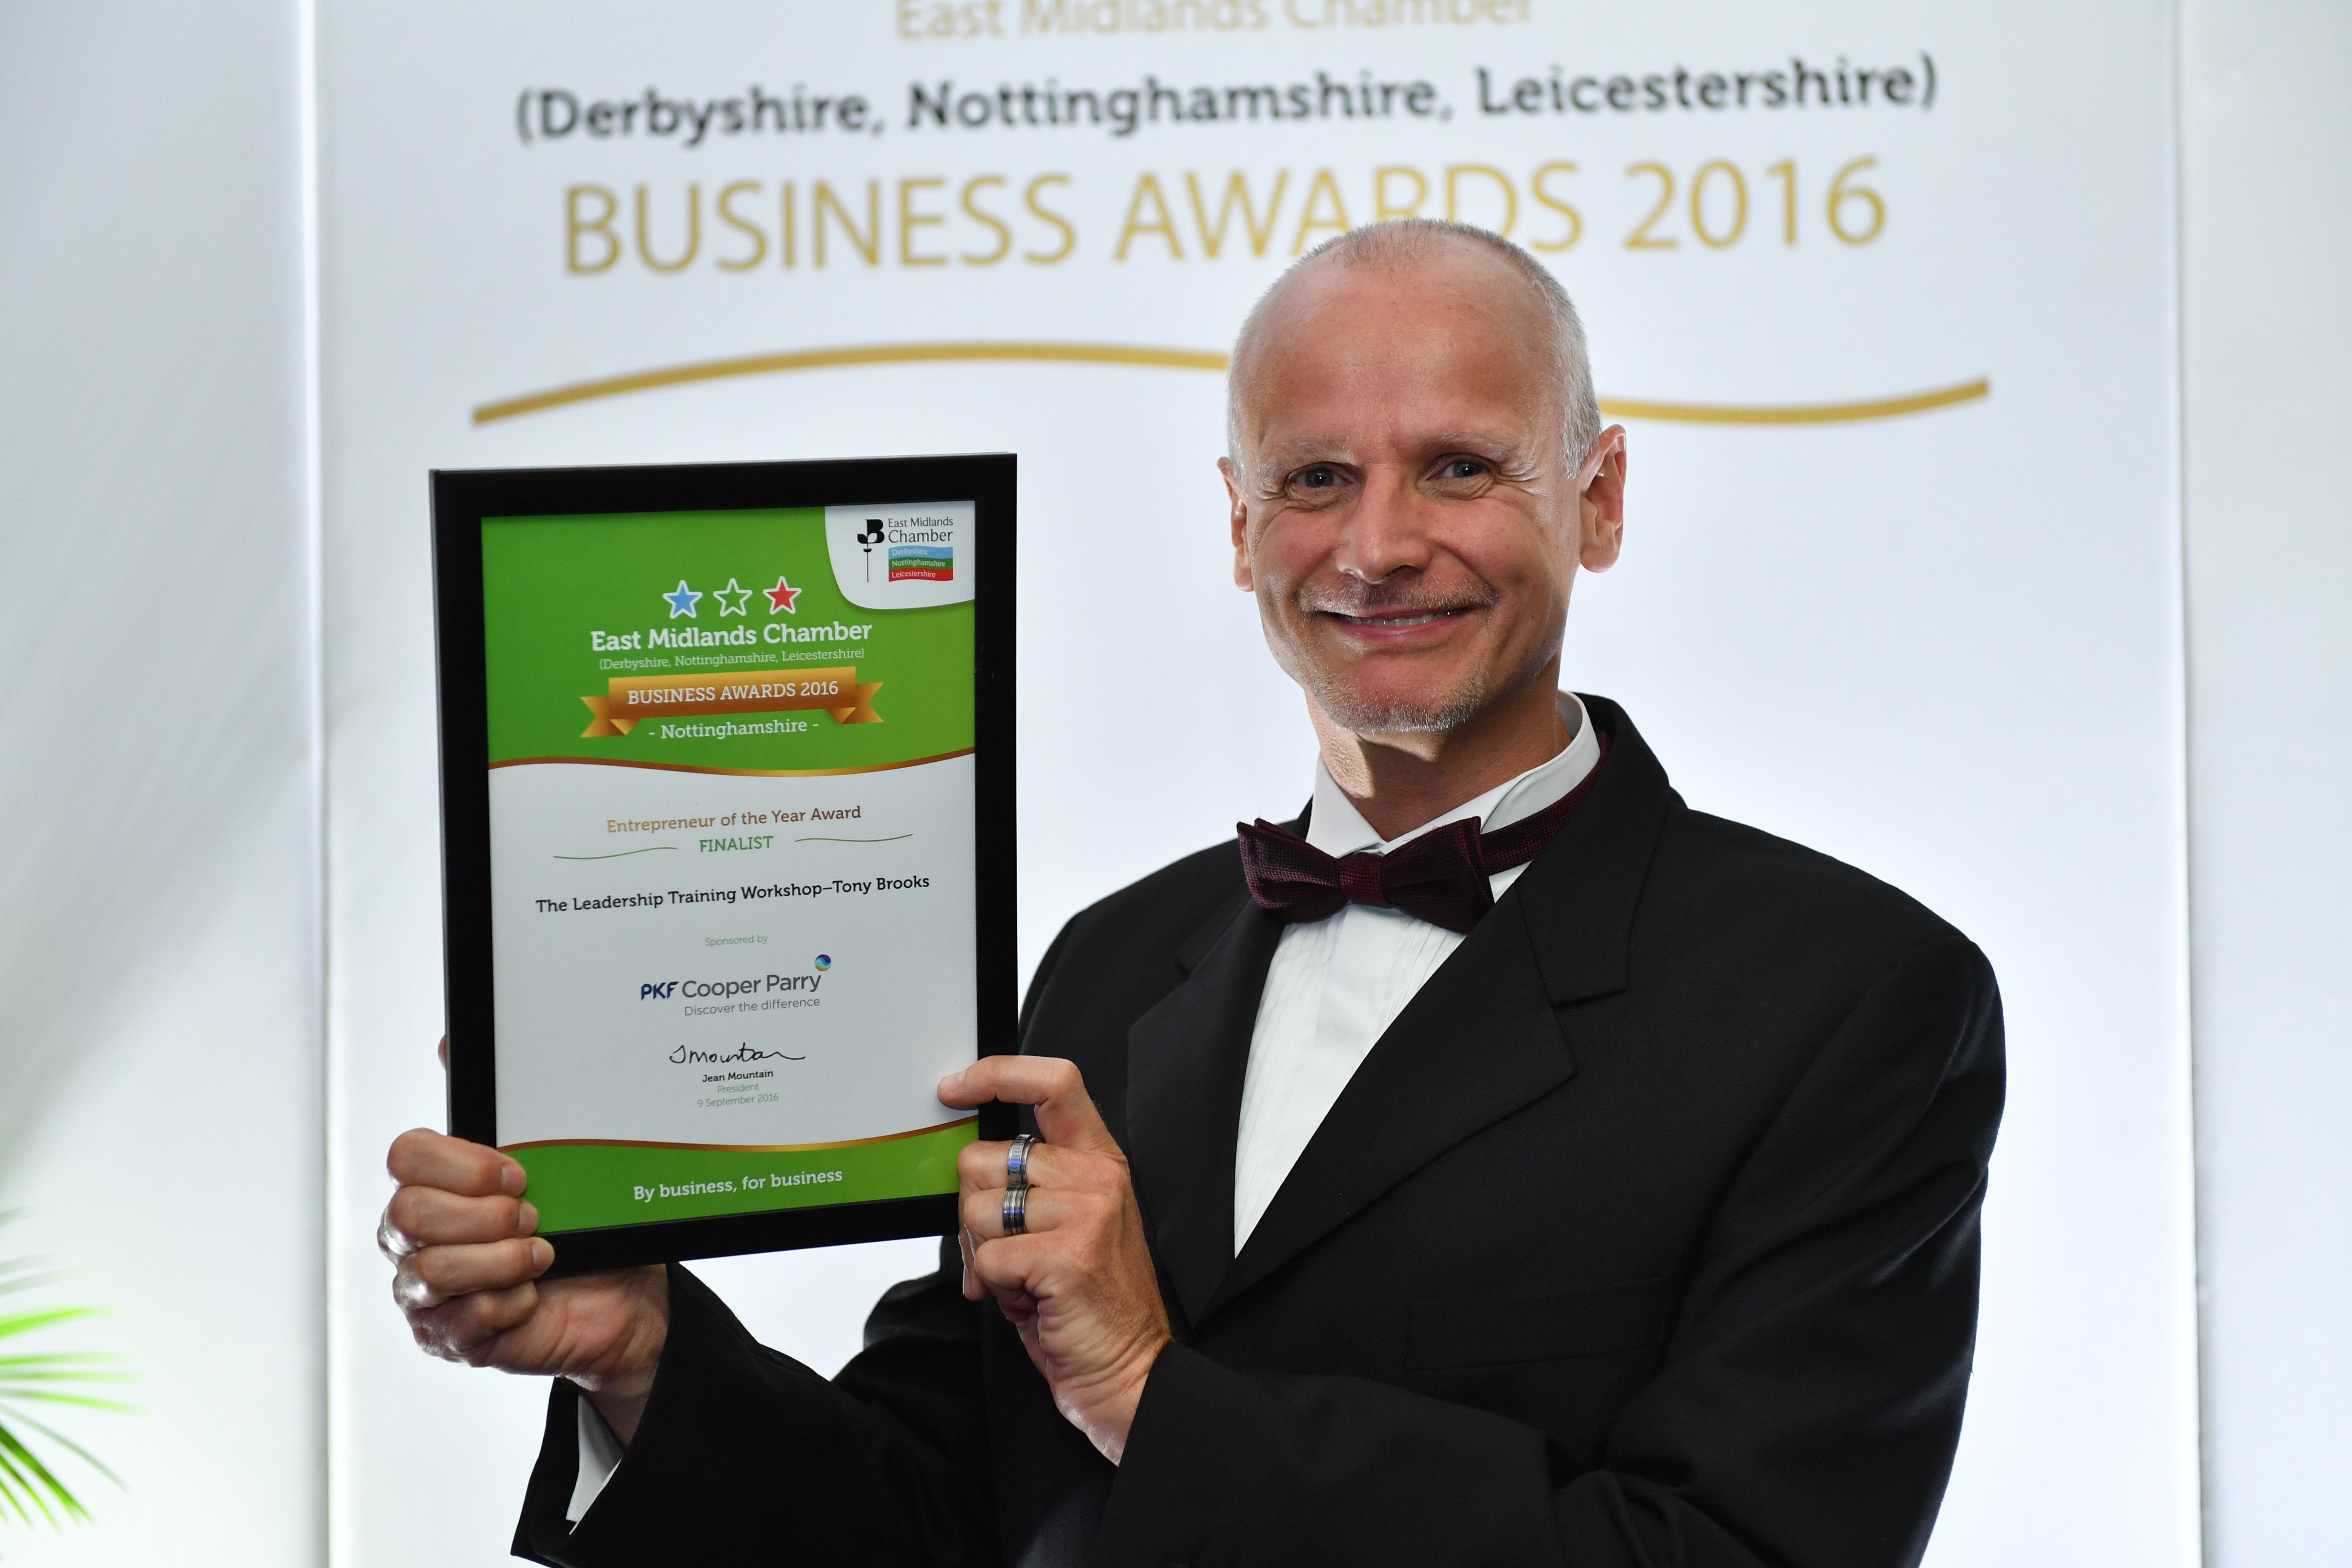 EMC Business Awards 2016 Finalist - Notts